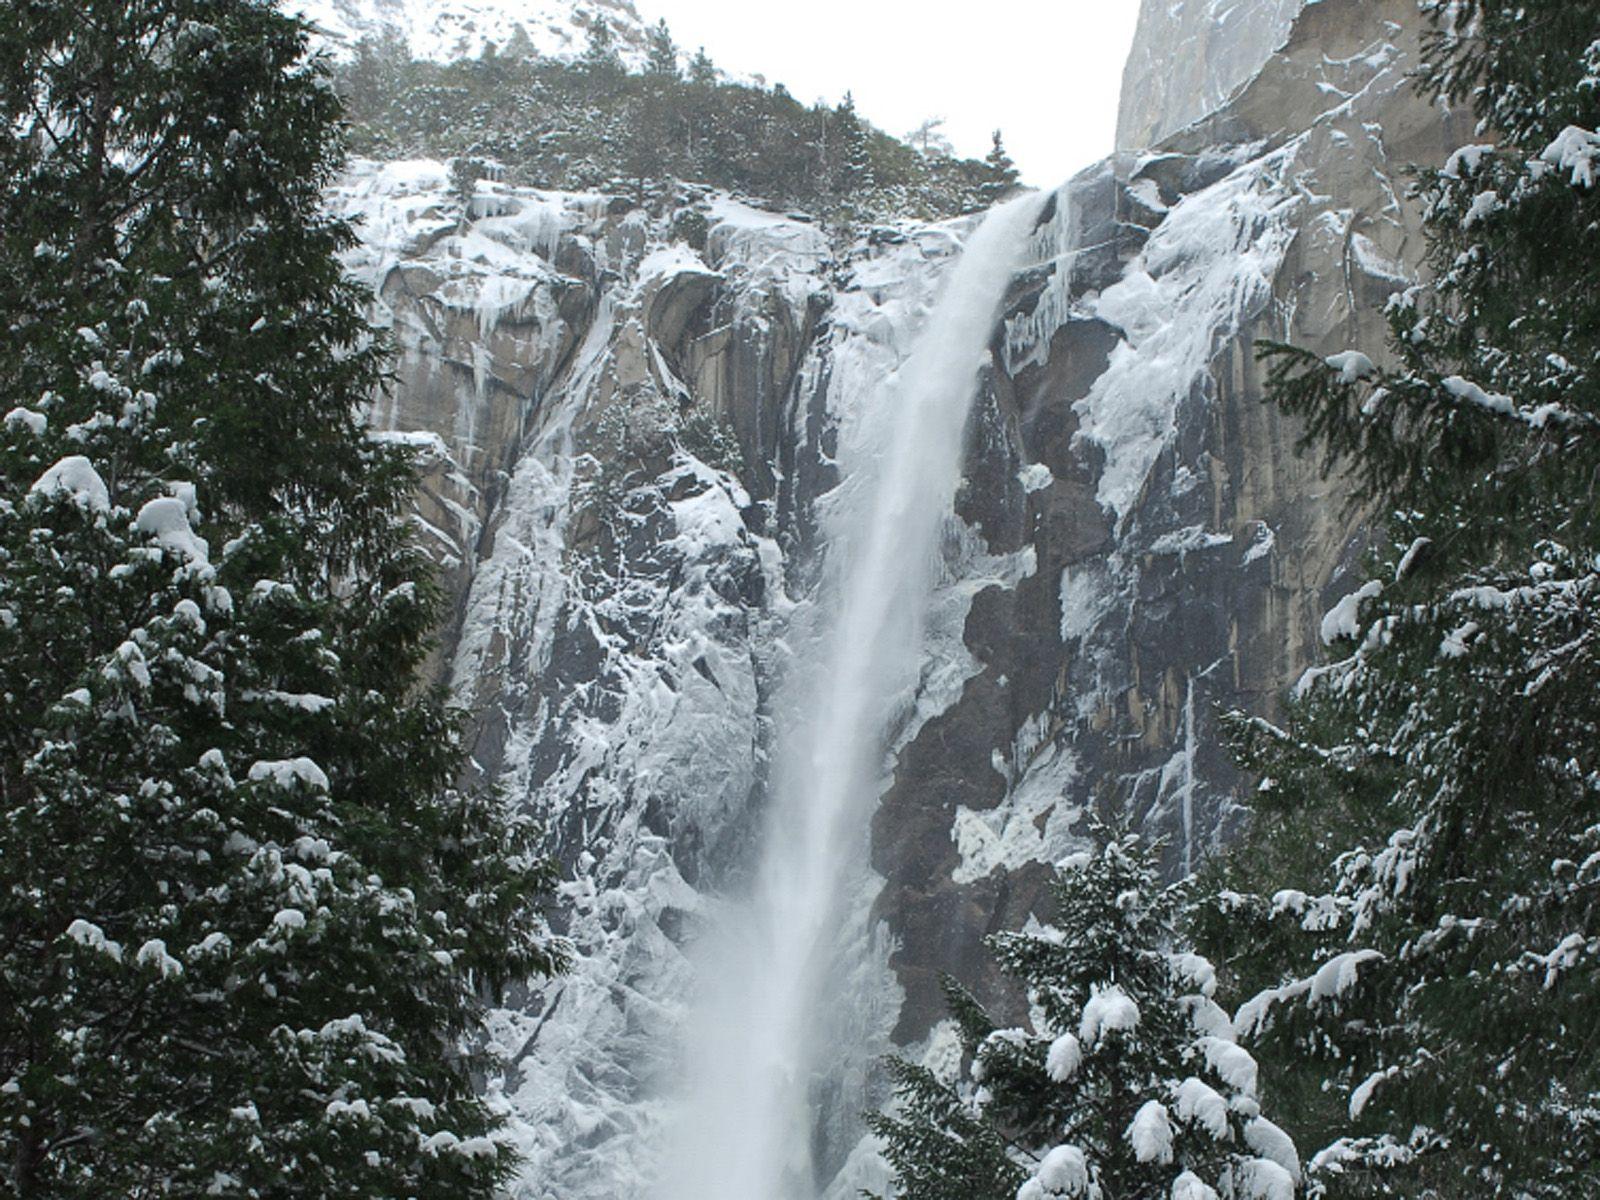 Водопад Брайдлвейл зимой